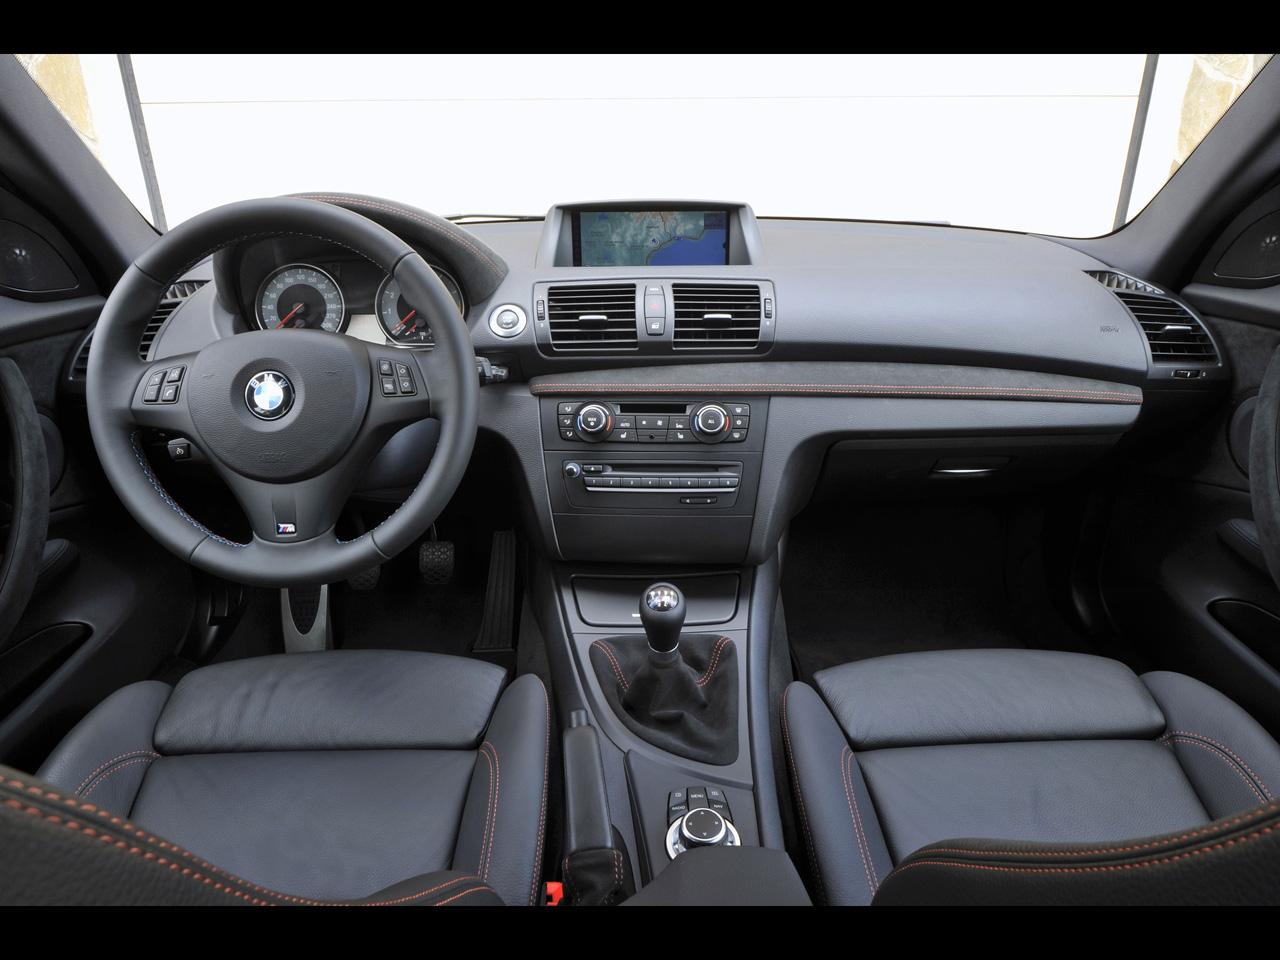 BMW 1M I (E82) 2011 - now Coupe #8